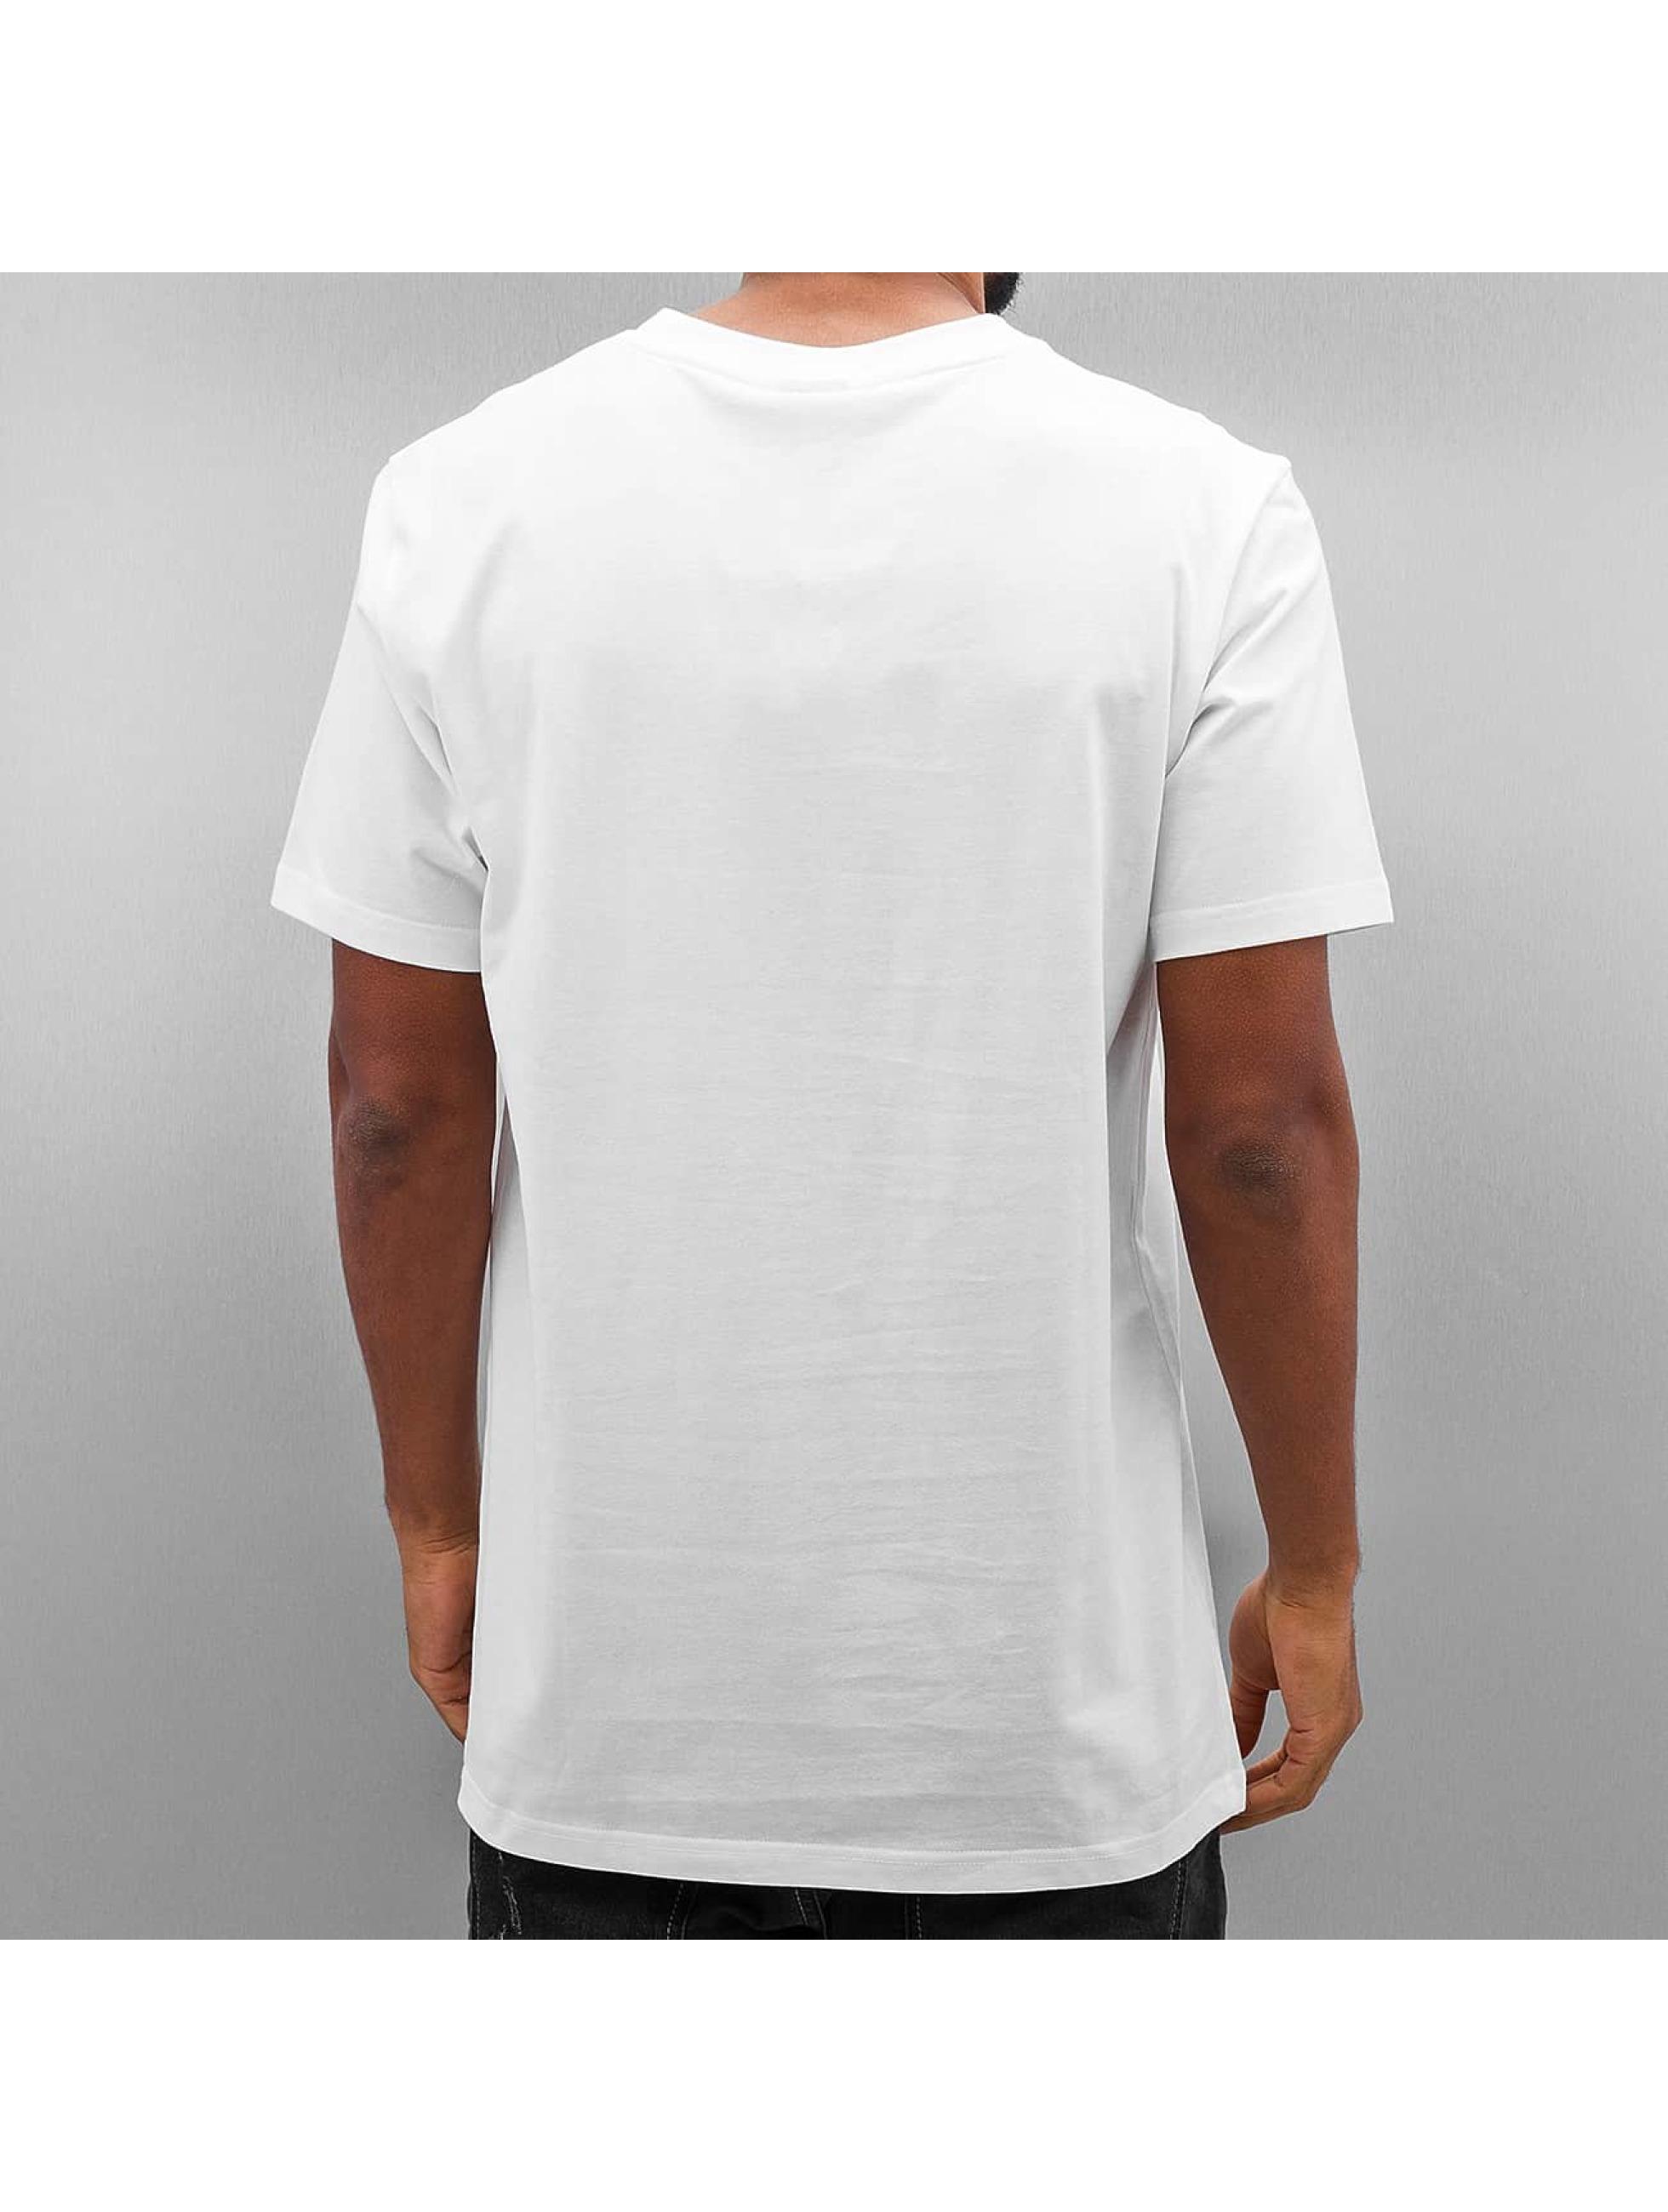 K1X T-Shirt Authentic white